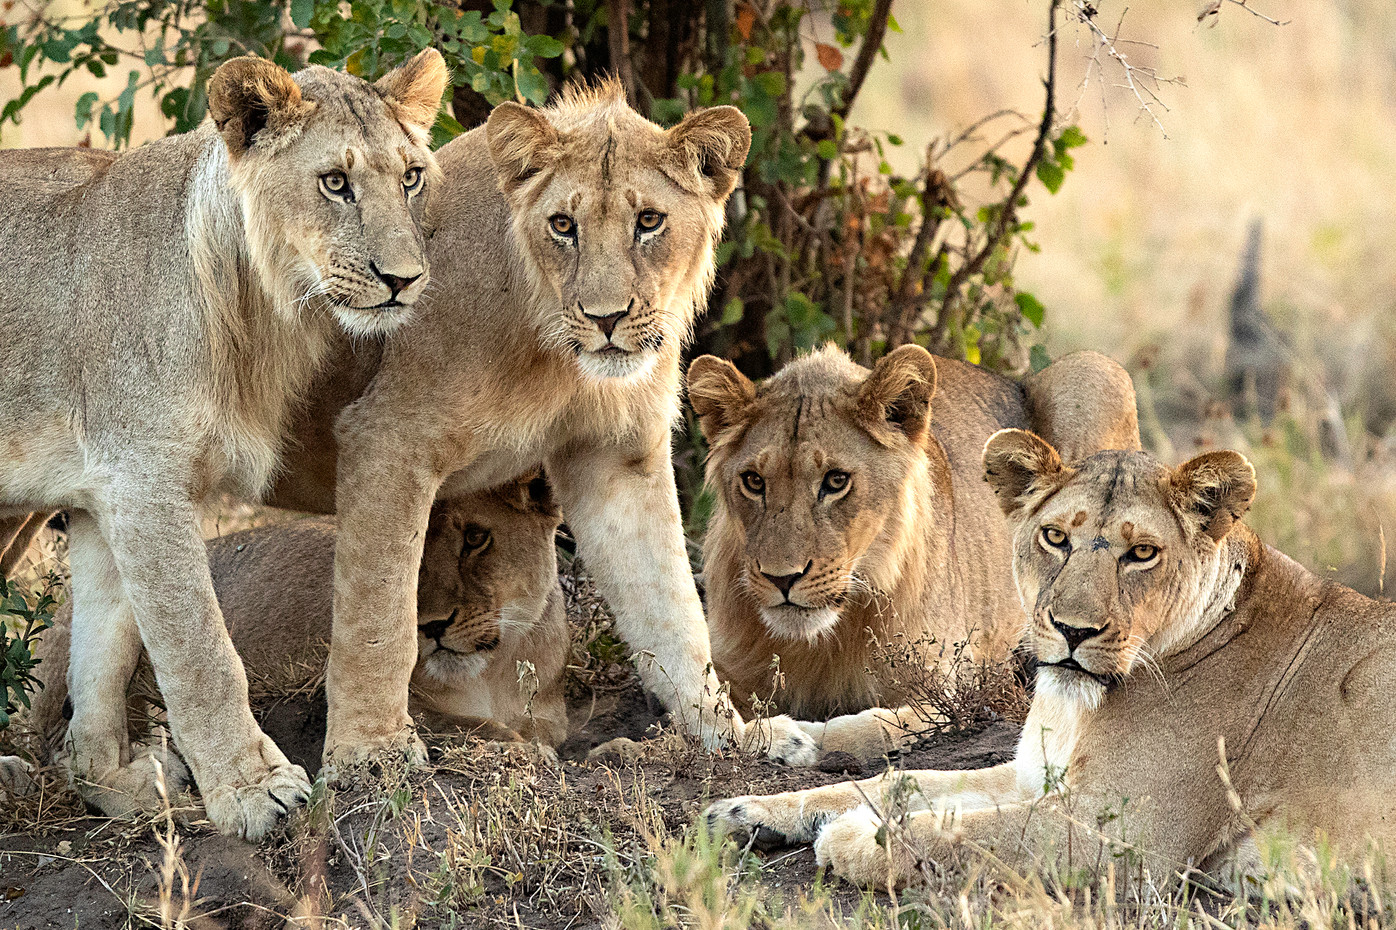 Lions in the Serengeti NP, Tanzania